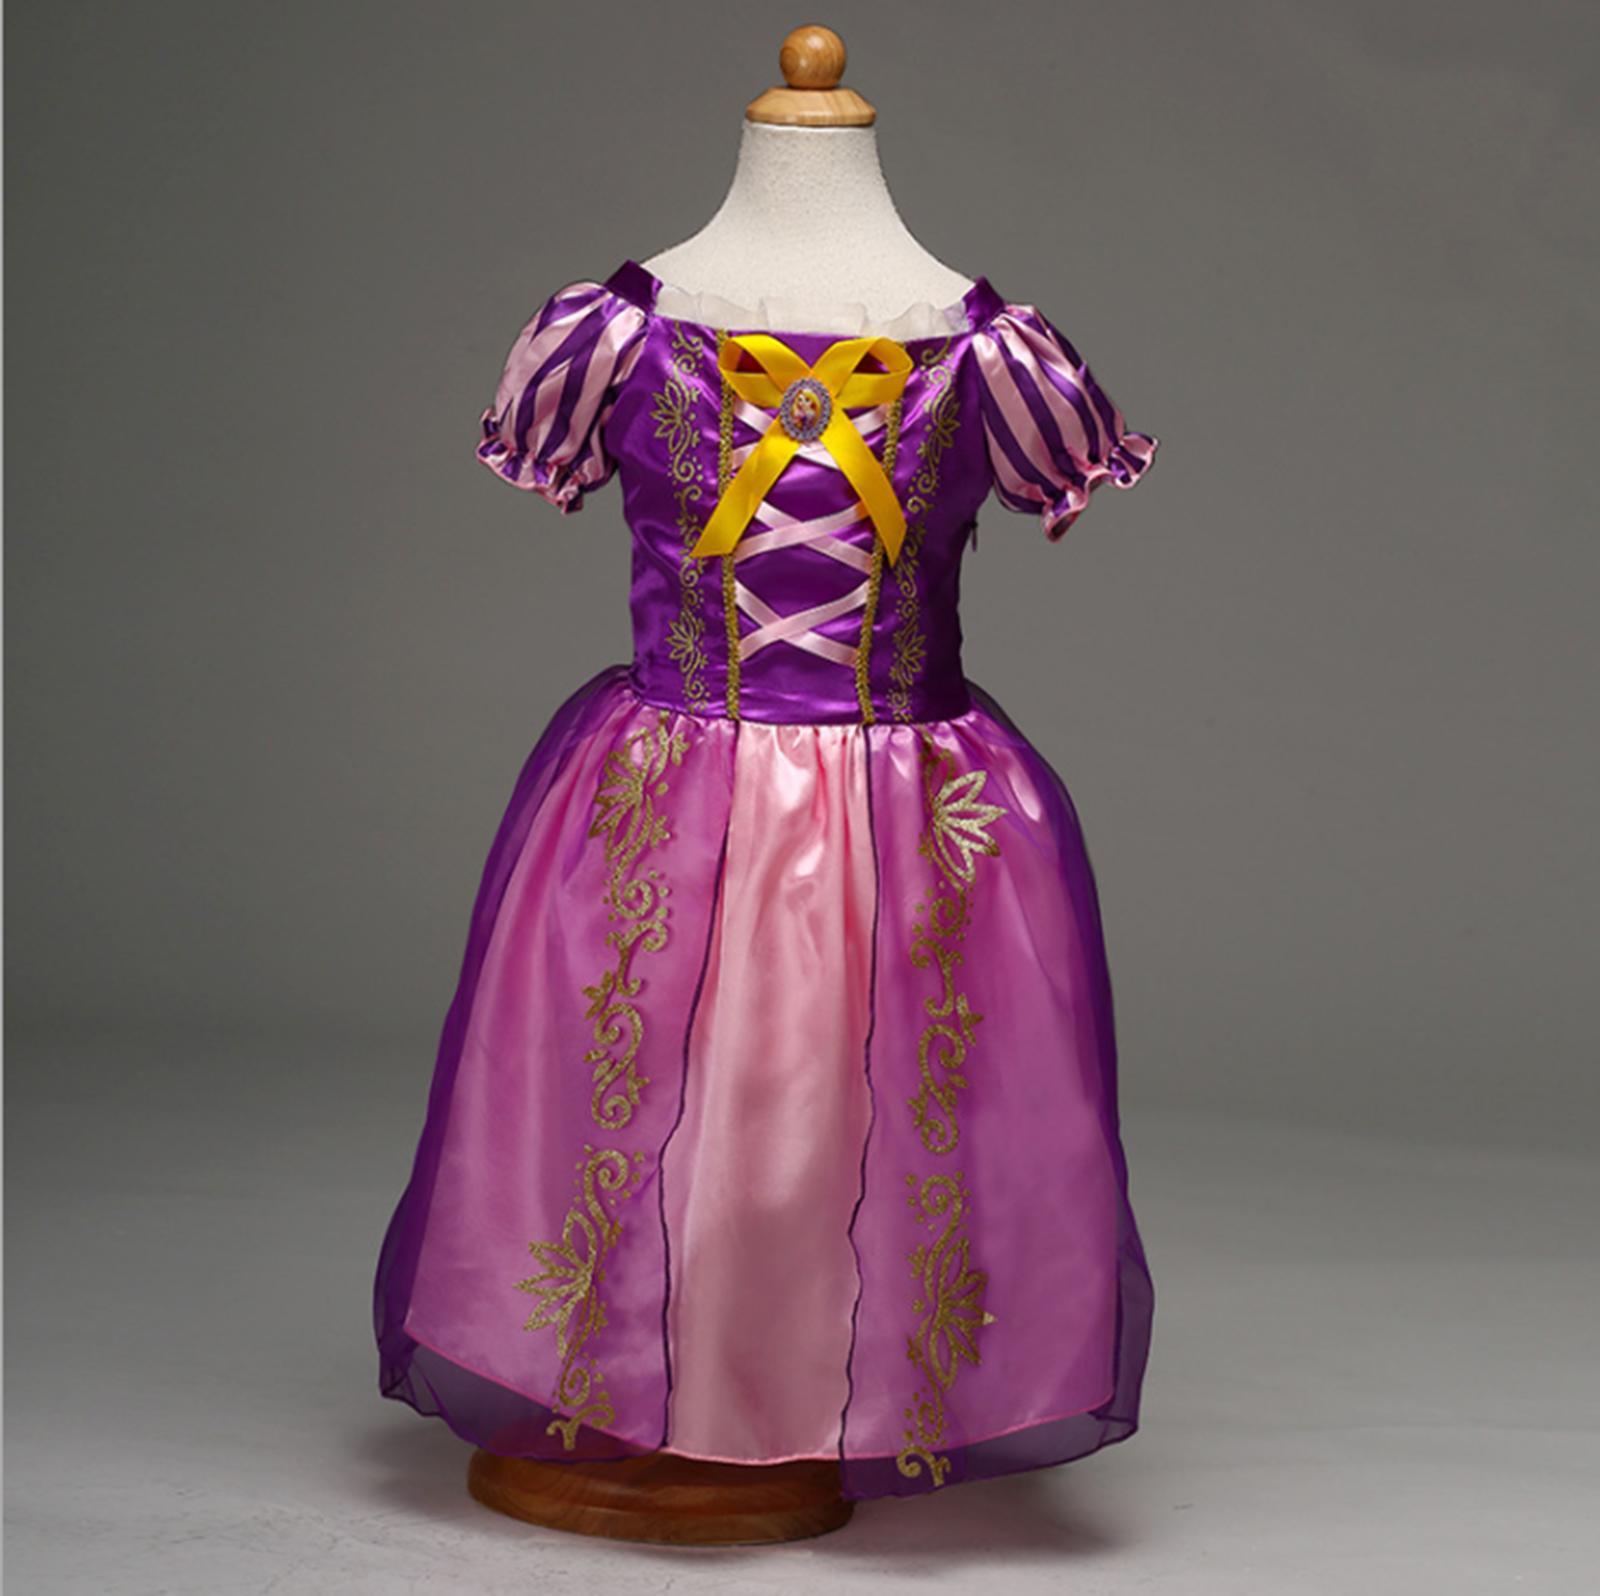 frozen princess elsa coronation dress kids costume